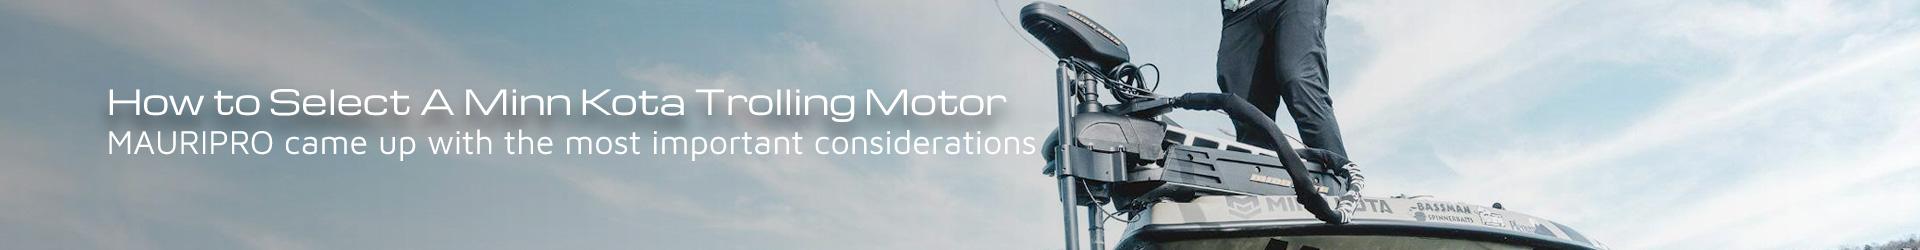 How to Select a Minn Kota Trolling Motor